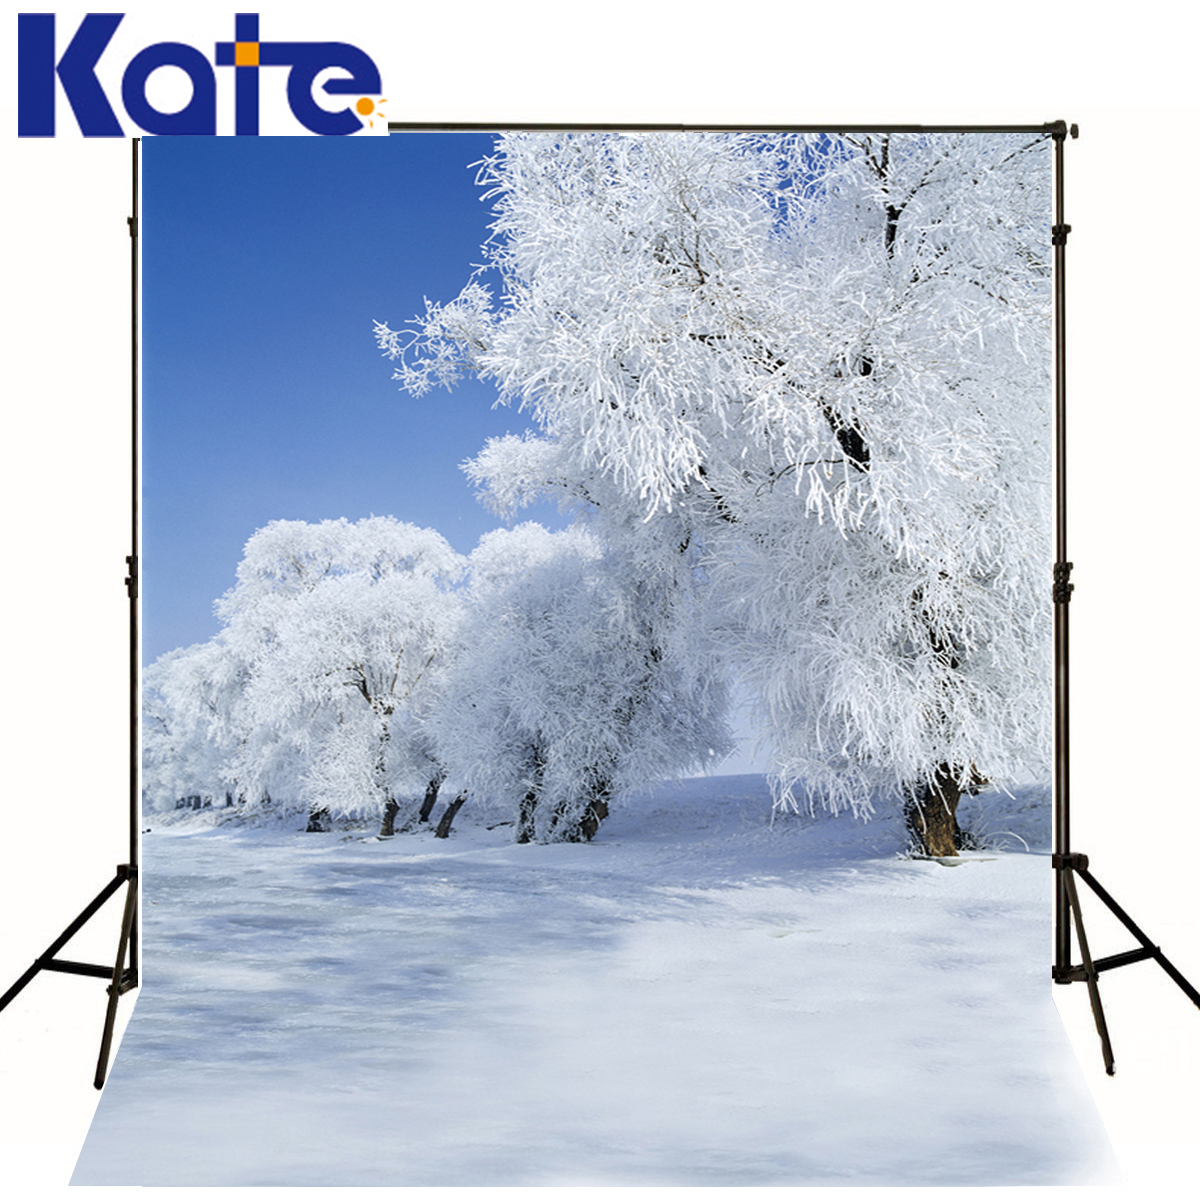 Kate Backgrounds Fotografia Snowstorm White Snow In Tree Backdrops Photography Scenery Blue Sky Backdrops For Photo Studio snowstorm pro